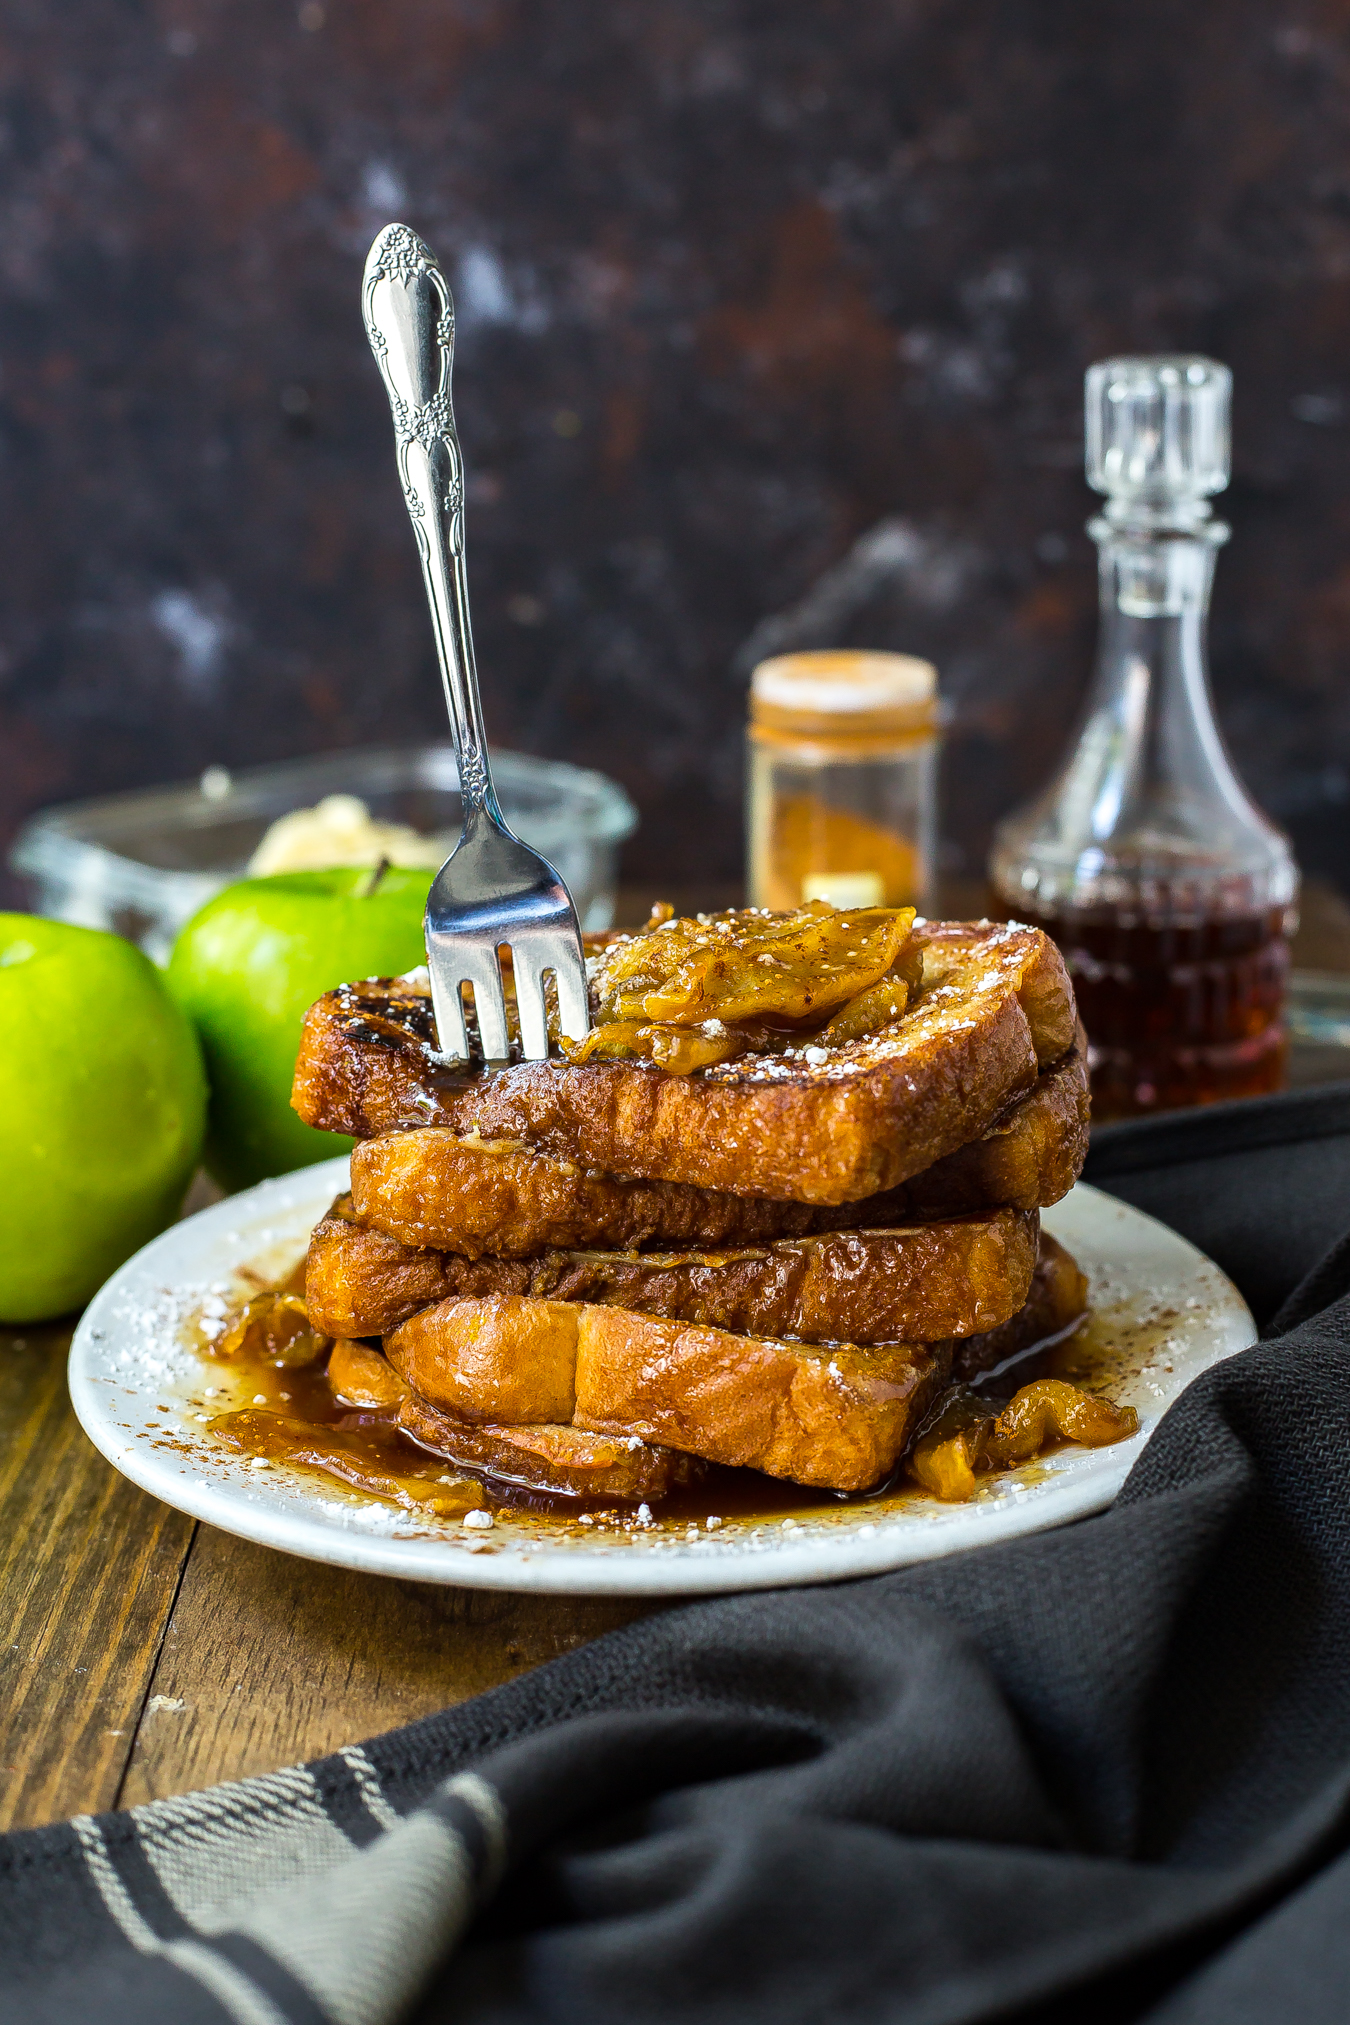 cinnamon-apple-french-toast-4.jpg